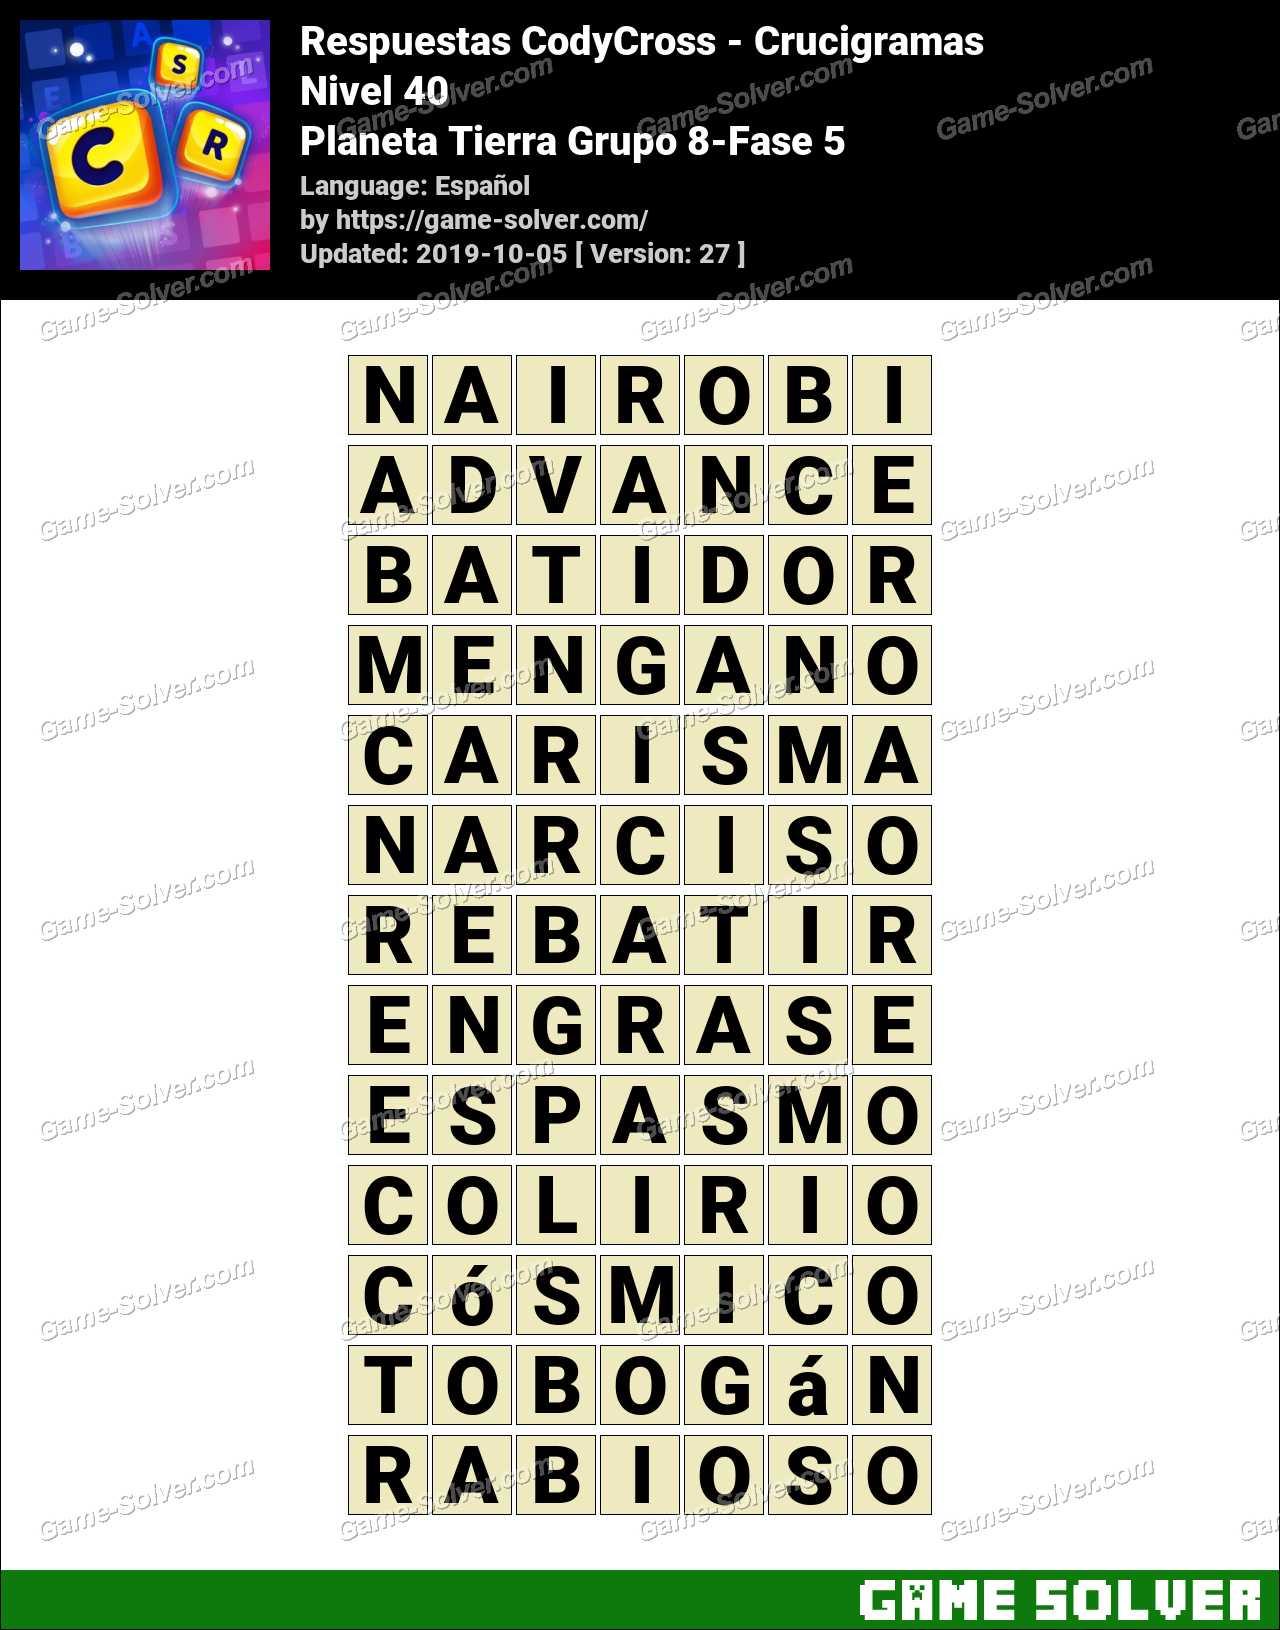 Respuestas CodyCross Planeta Tierra Grupo 8-Fase 5